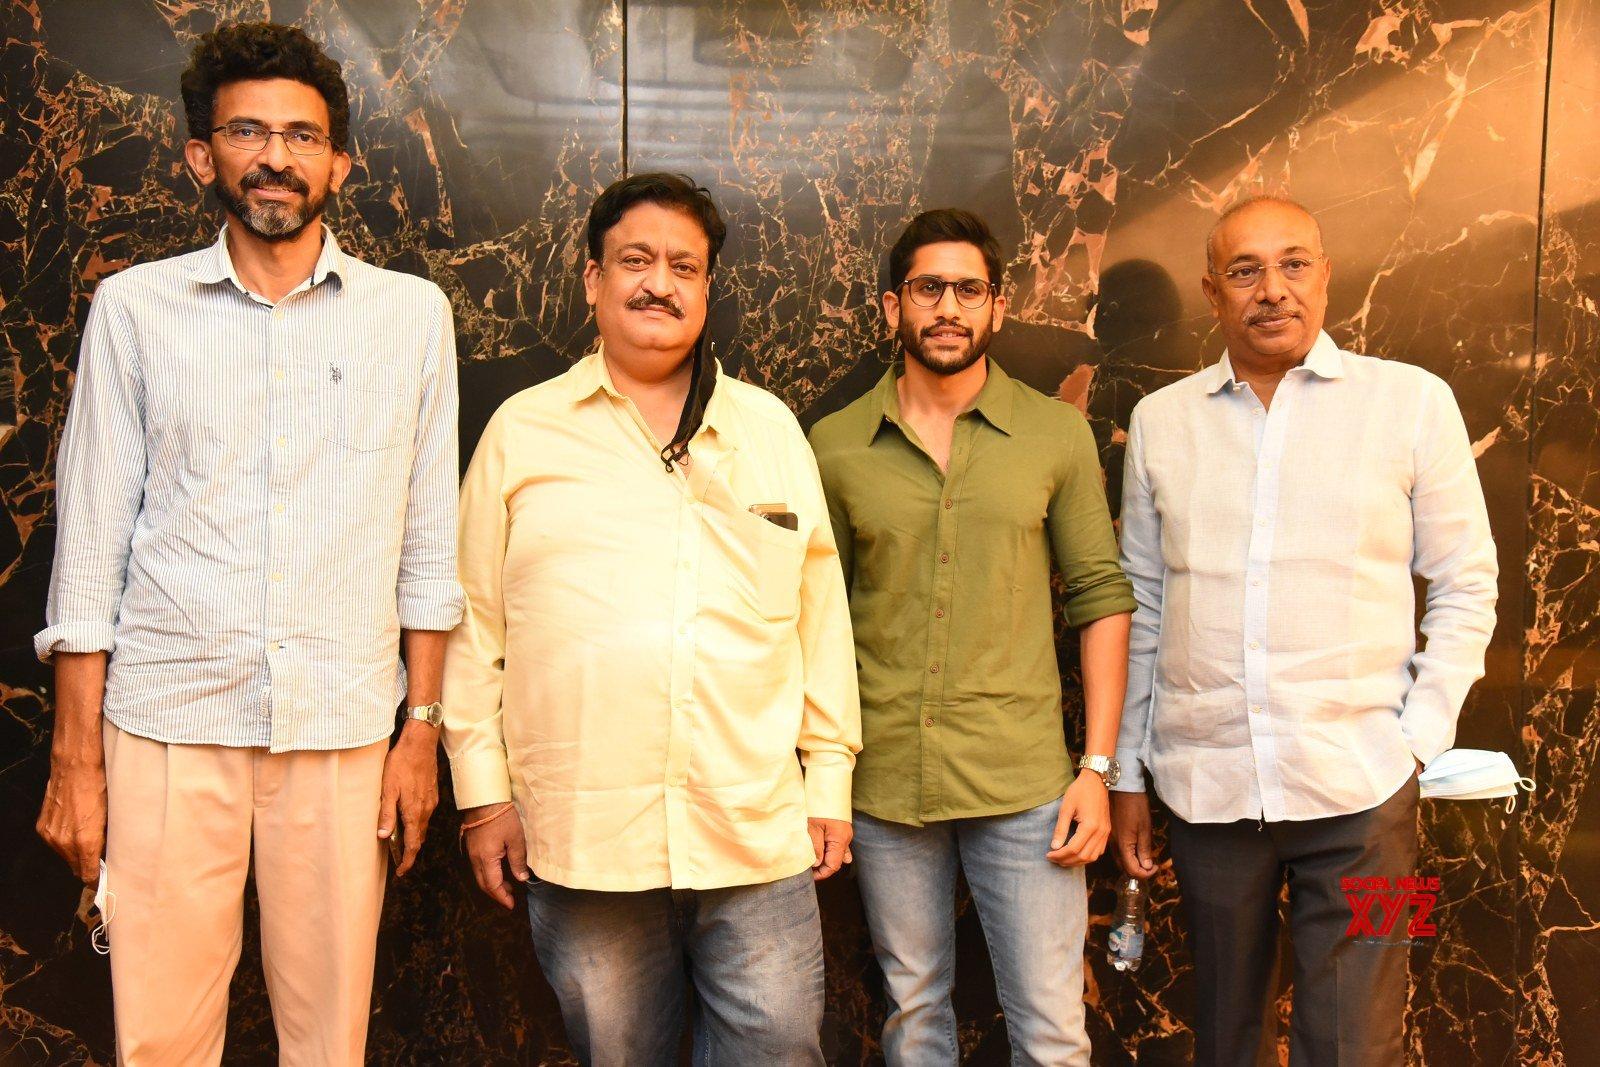 Naga Chaitanya And Sai Pallavi's Love Story Movie Postponement Press Meet - Gallery